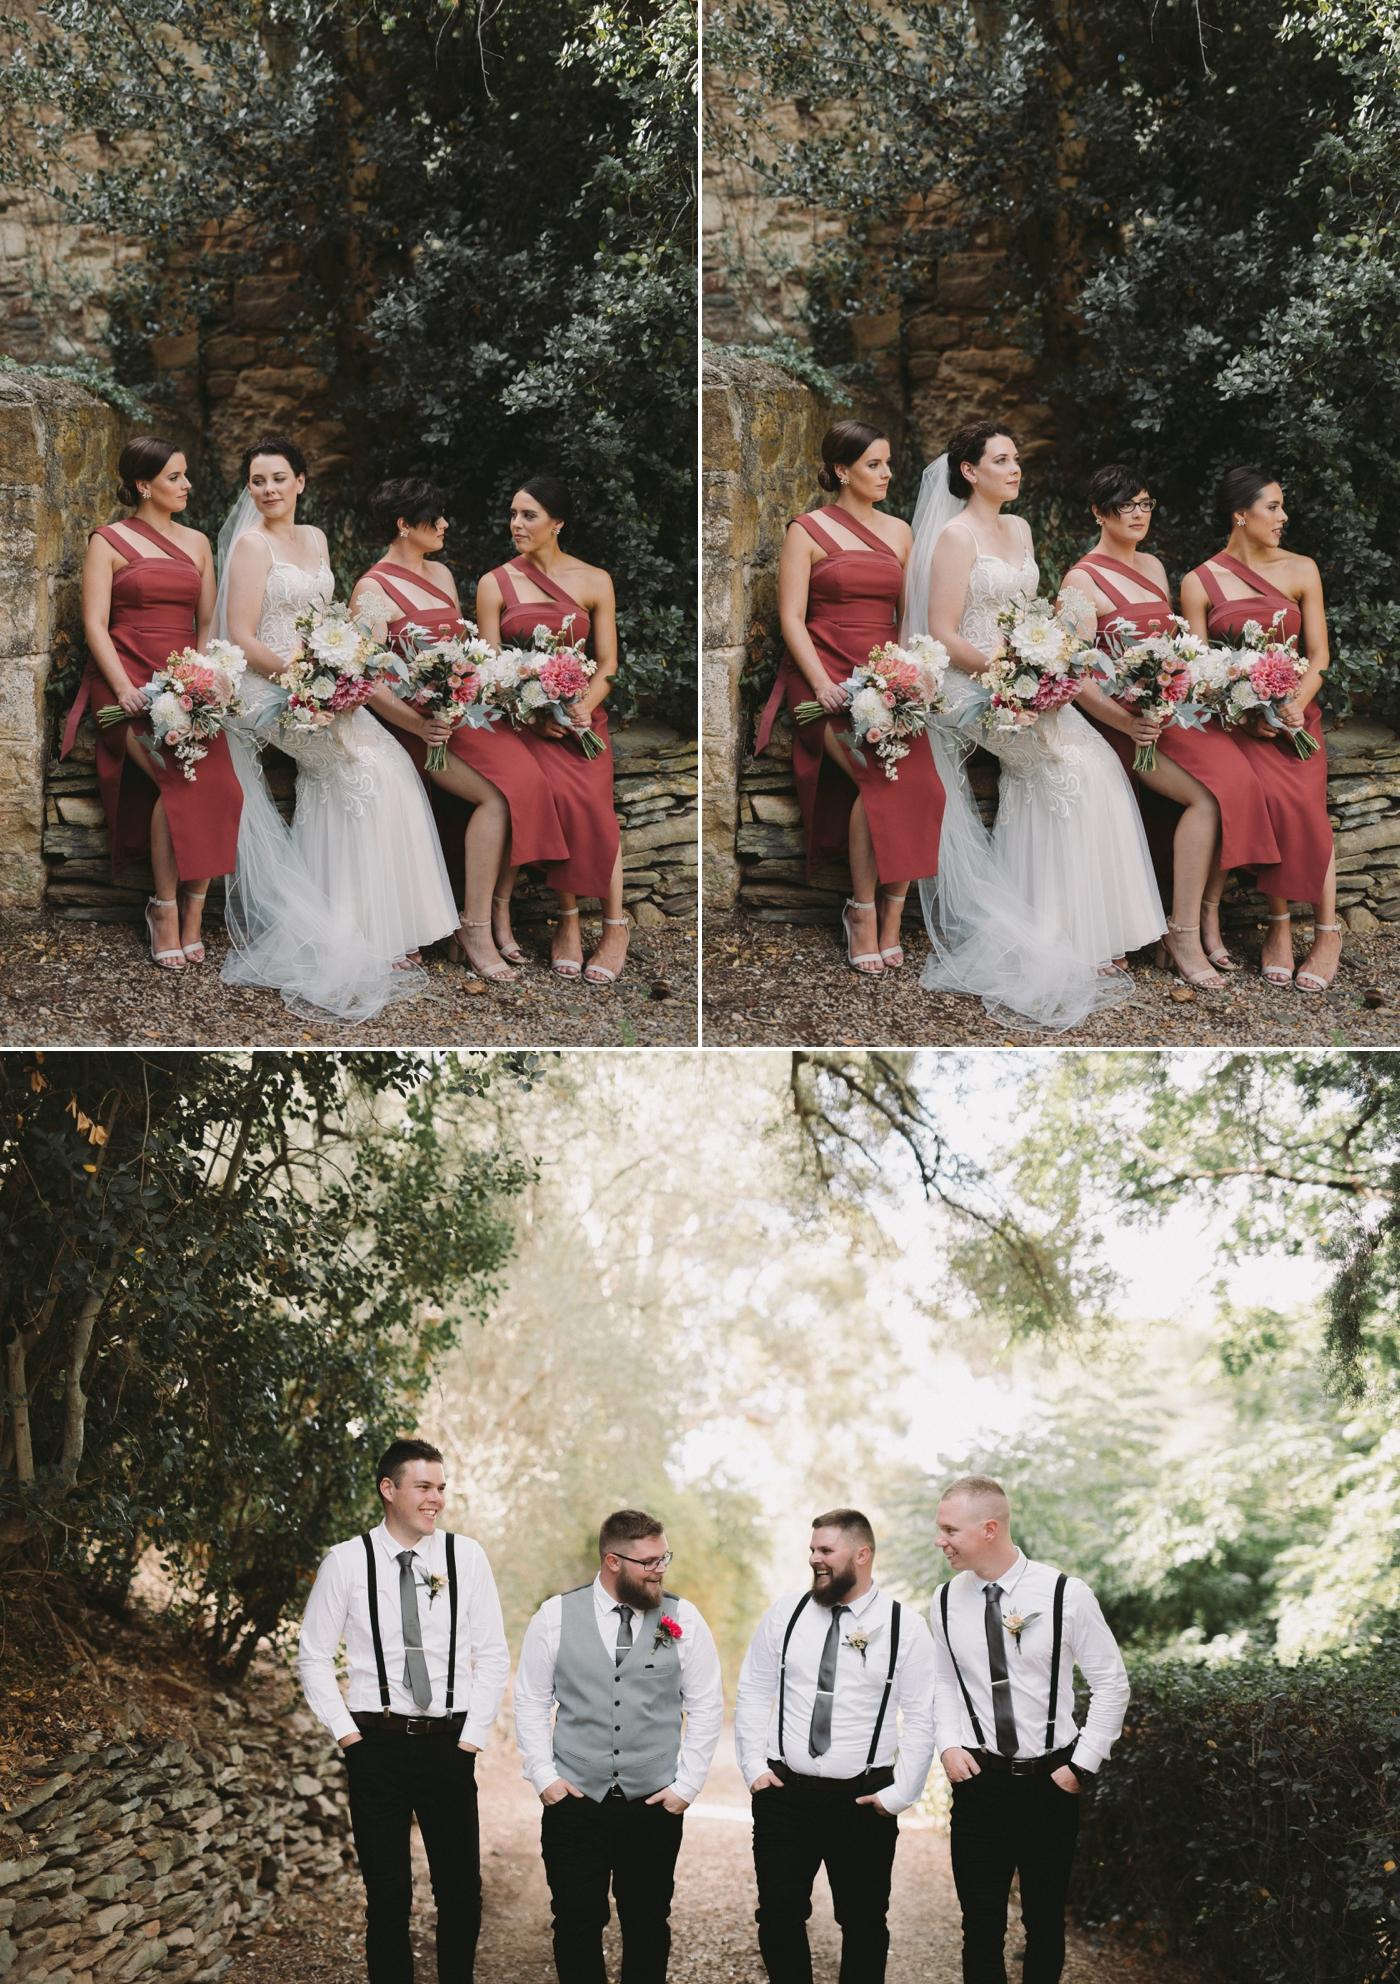 Emma & Aaron - Marybank Estate Wedding - Natural Wedding Photography in Adelaide - www.katherineschultzphotography.com_0051.jpg